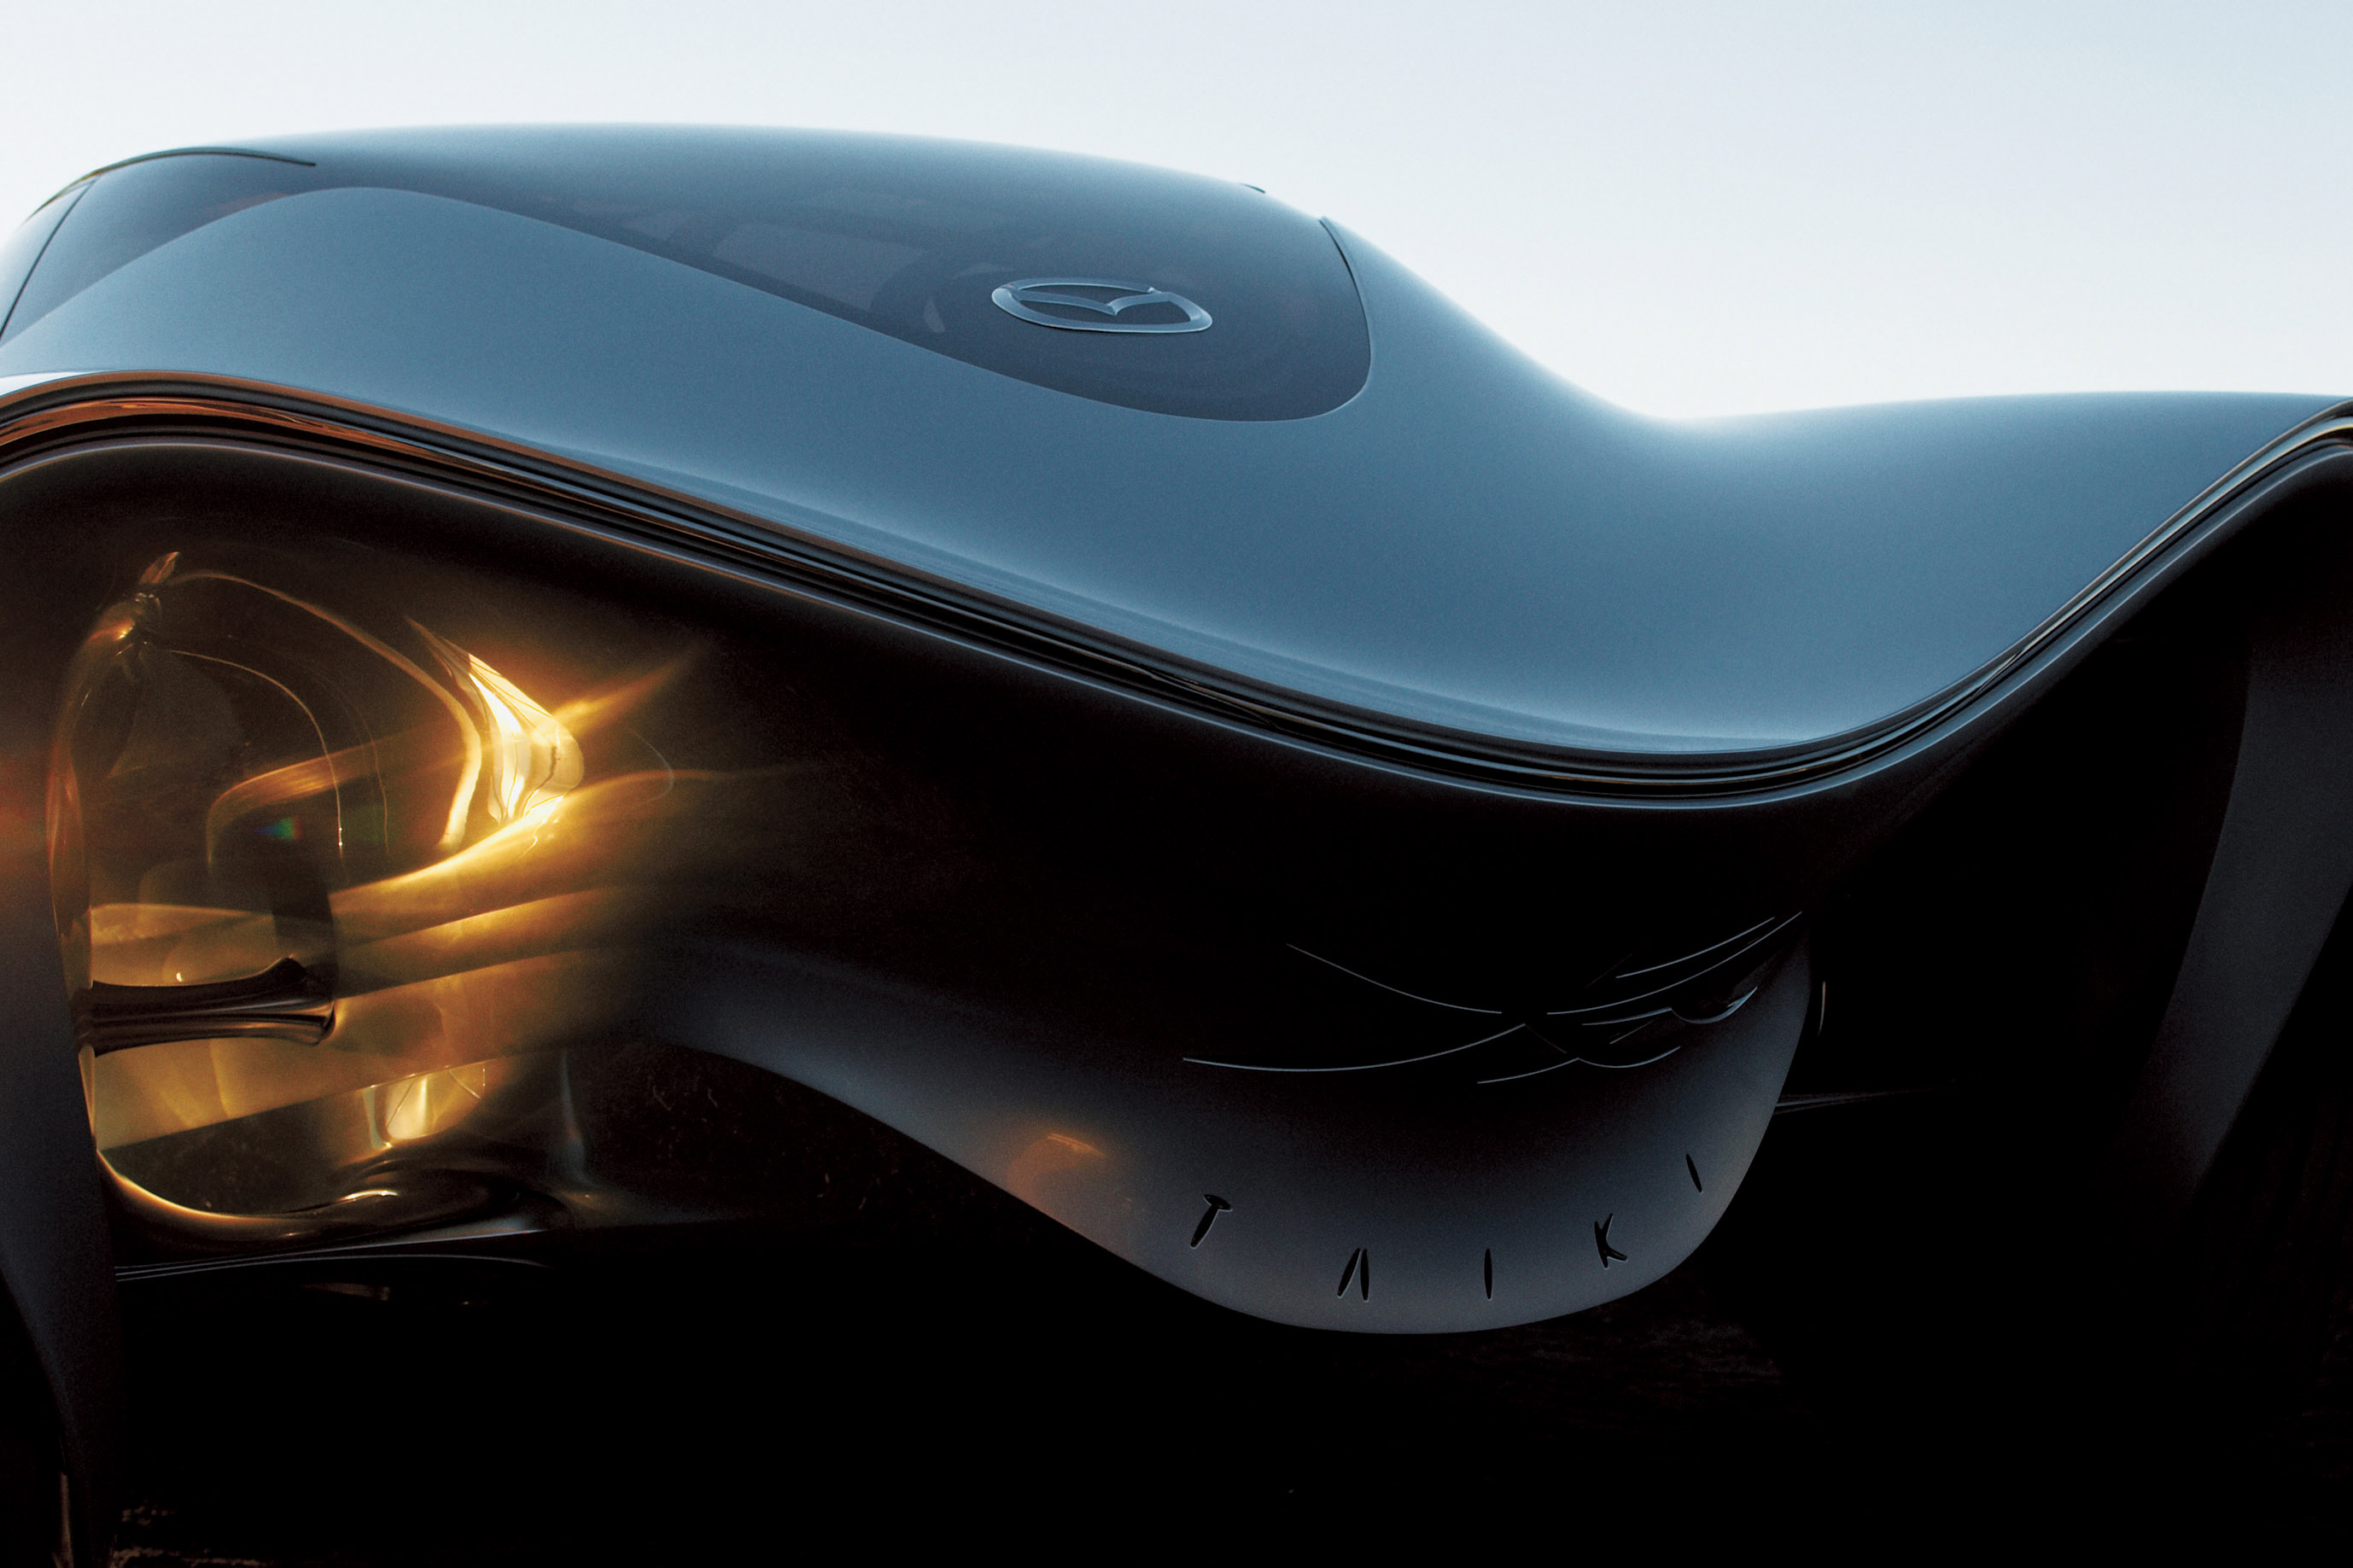 https://www.automobilesreview.com/gallery/mazda-taiki-concept/mazda-taiki-concept-09.jpg